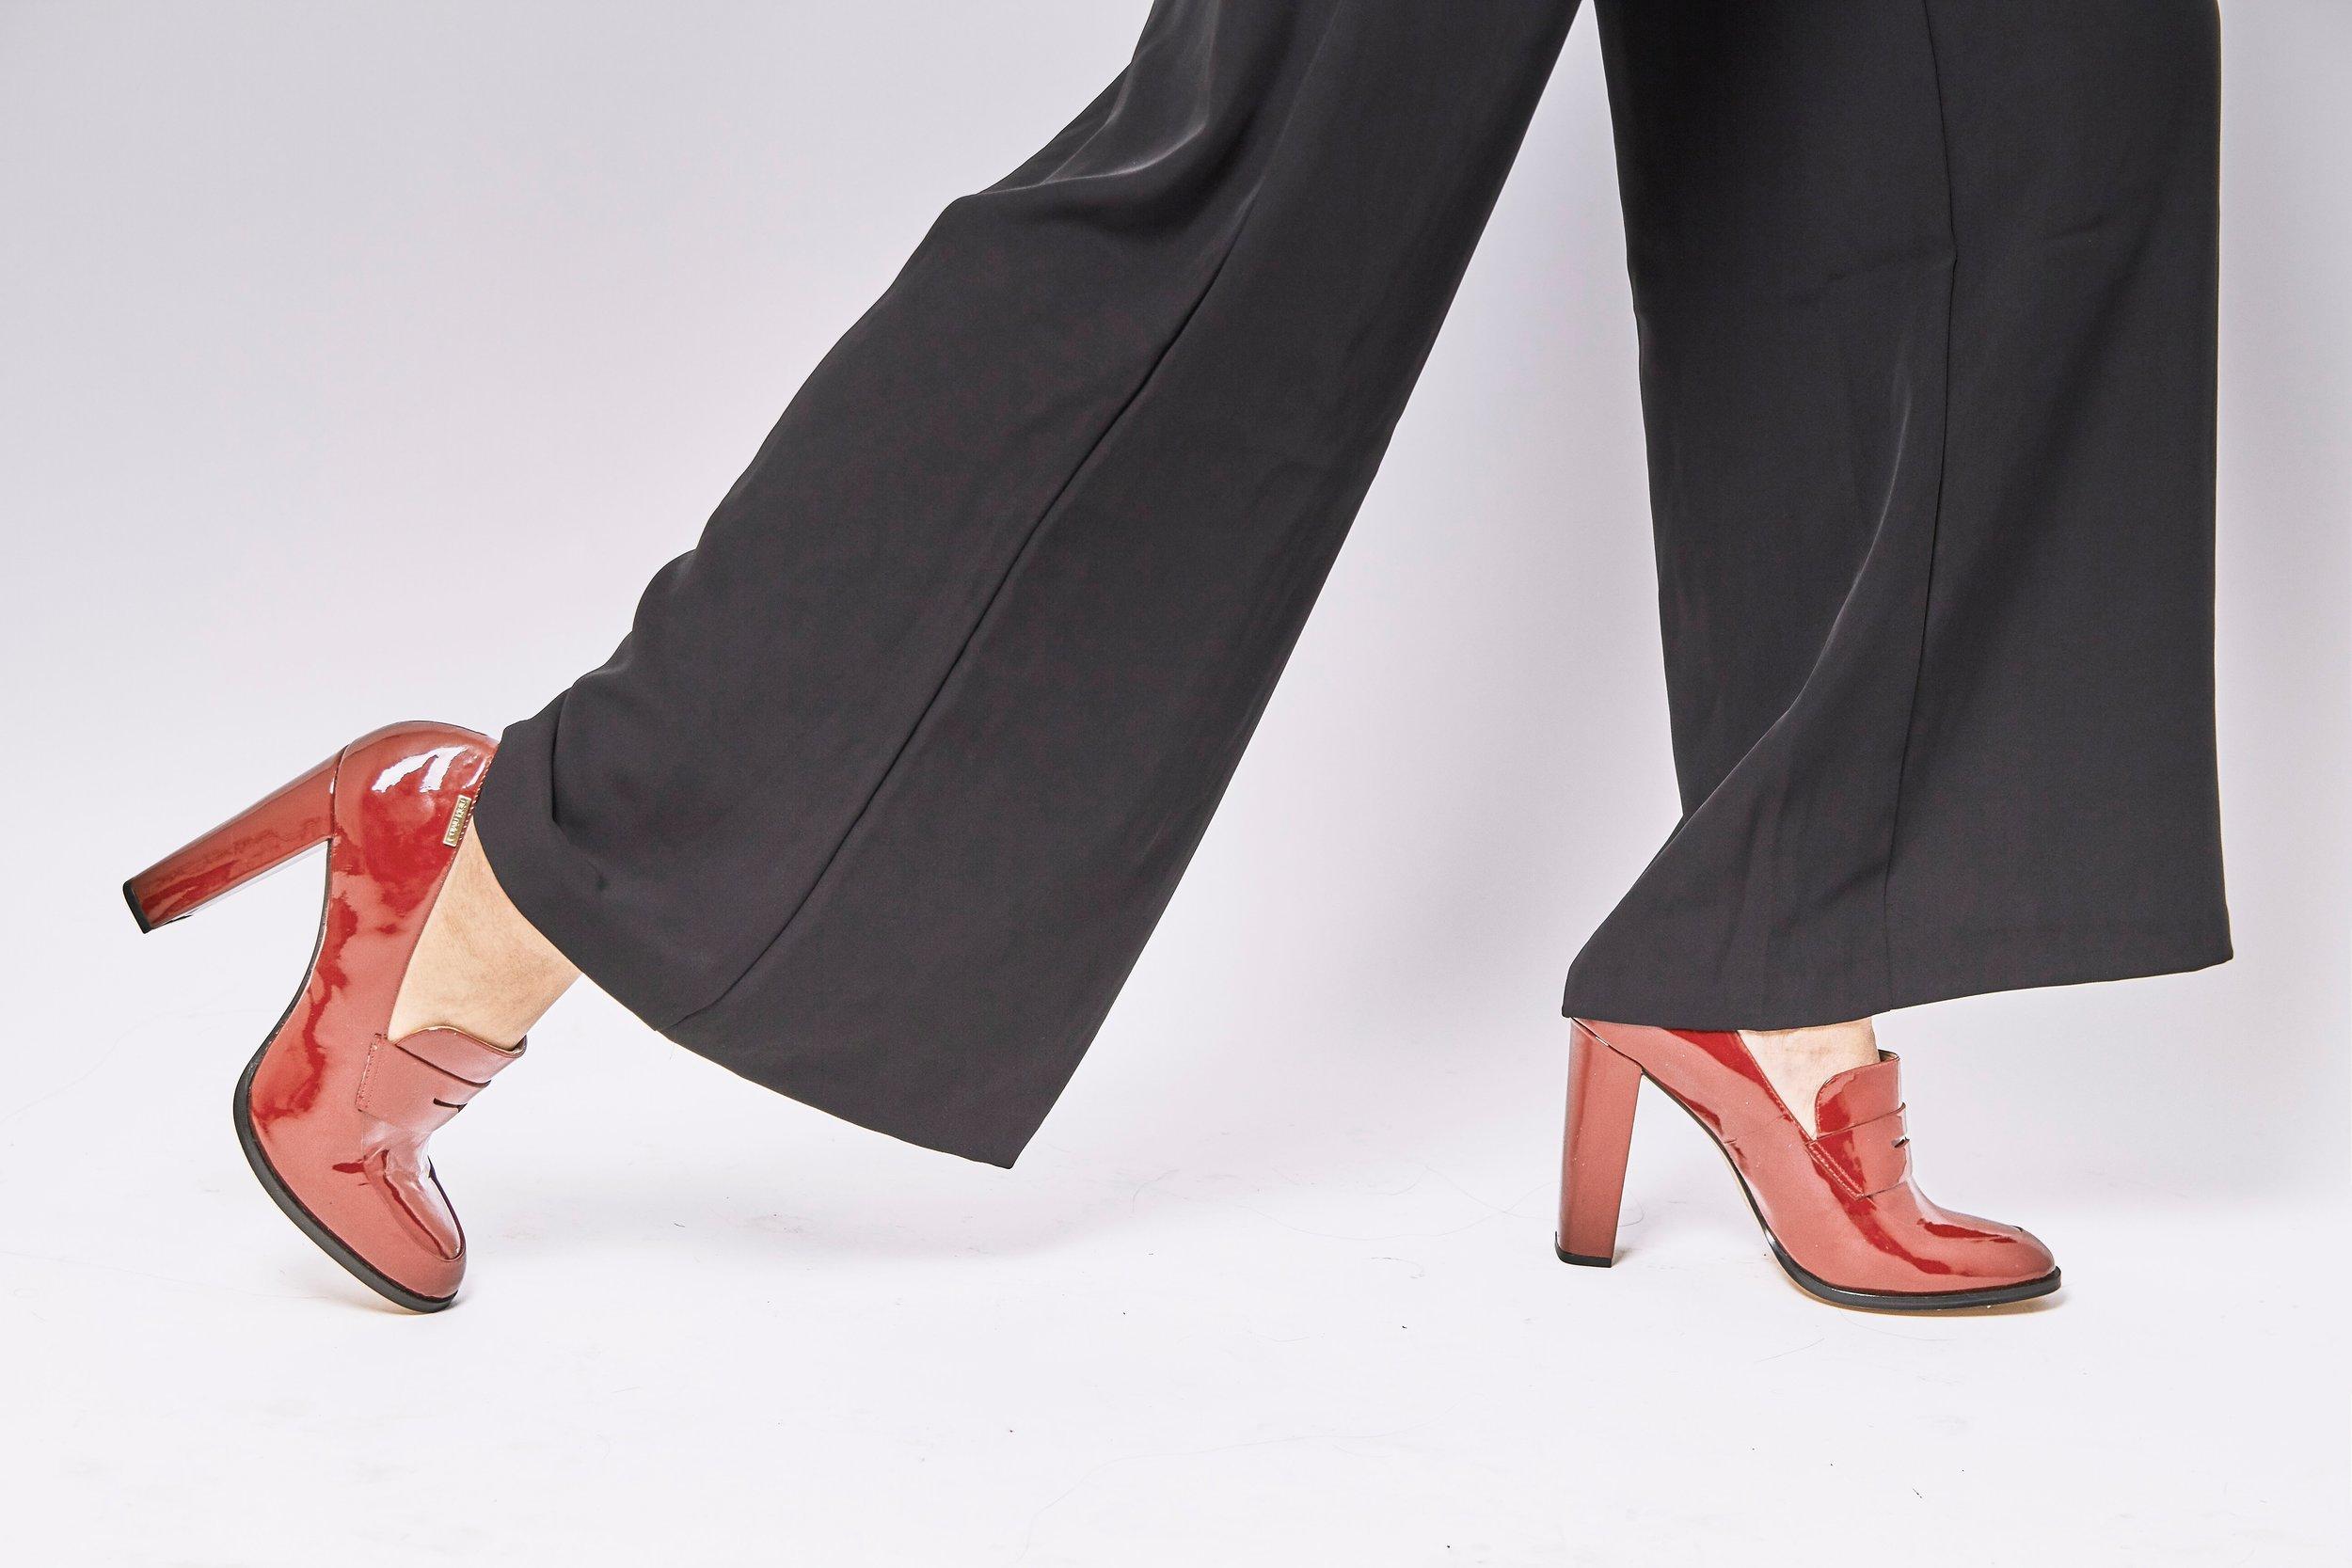 contemporary-fashion-fashionable-1228626.jpg